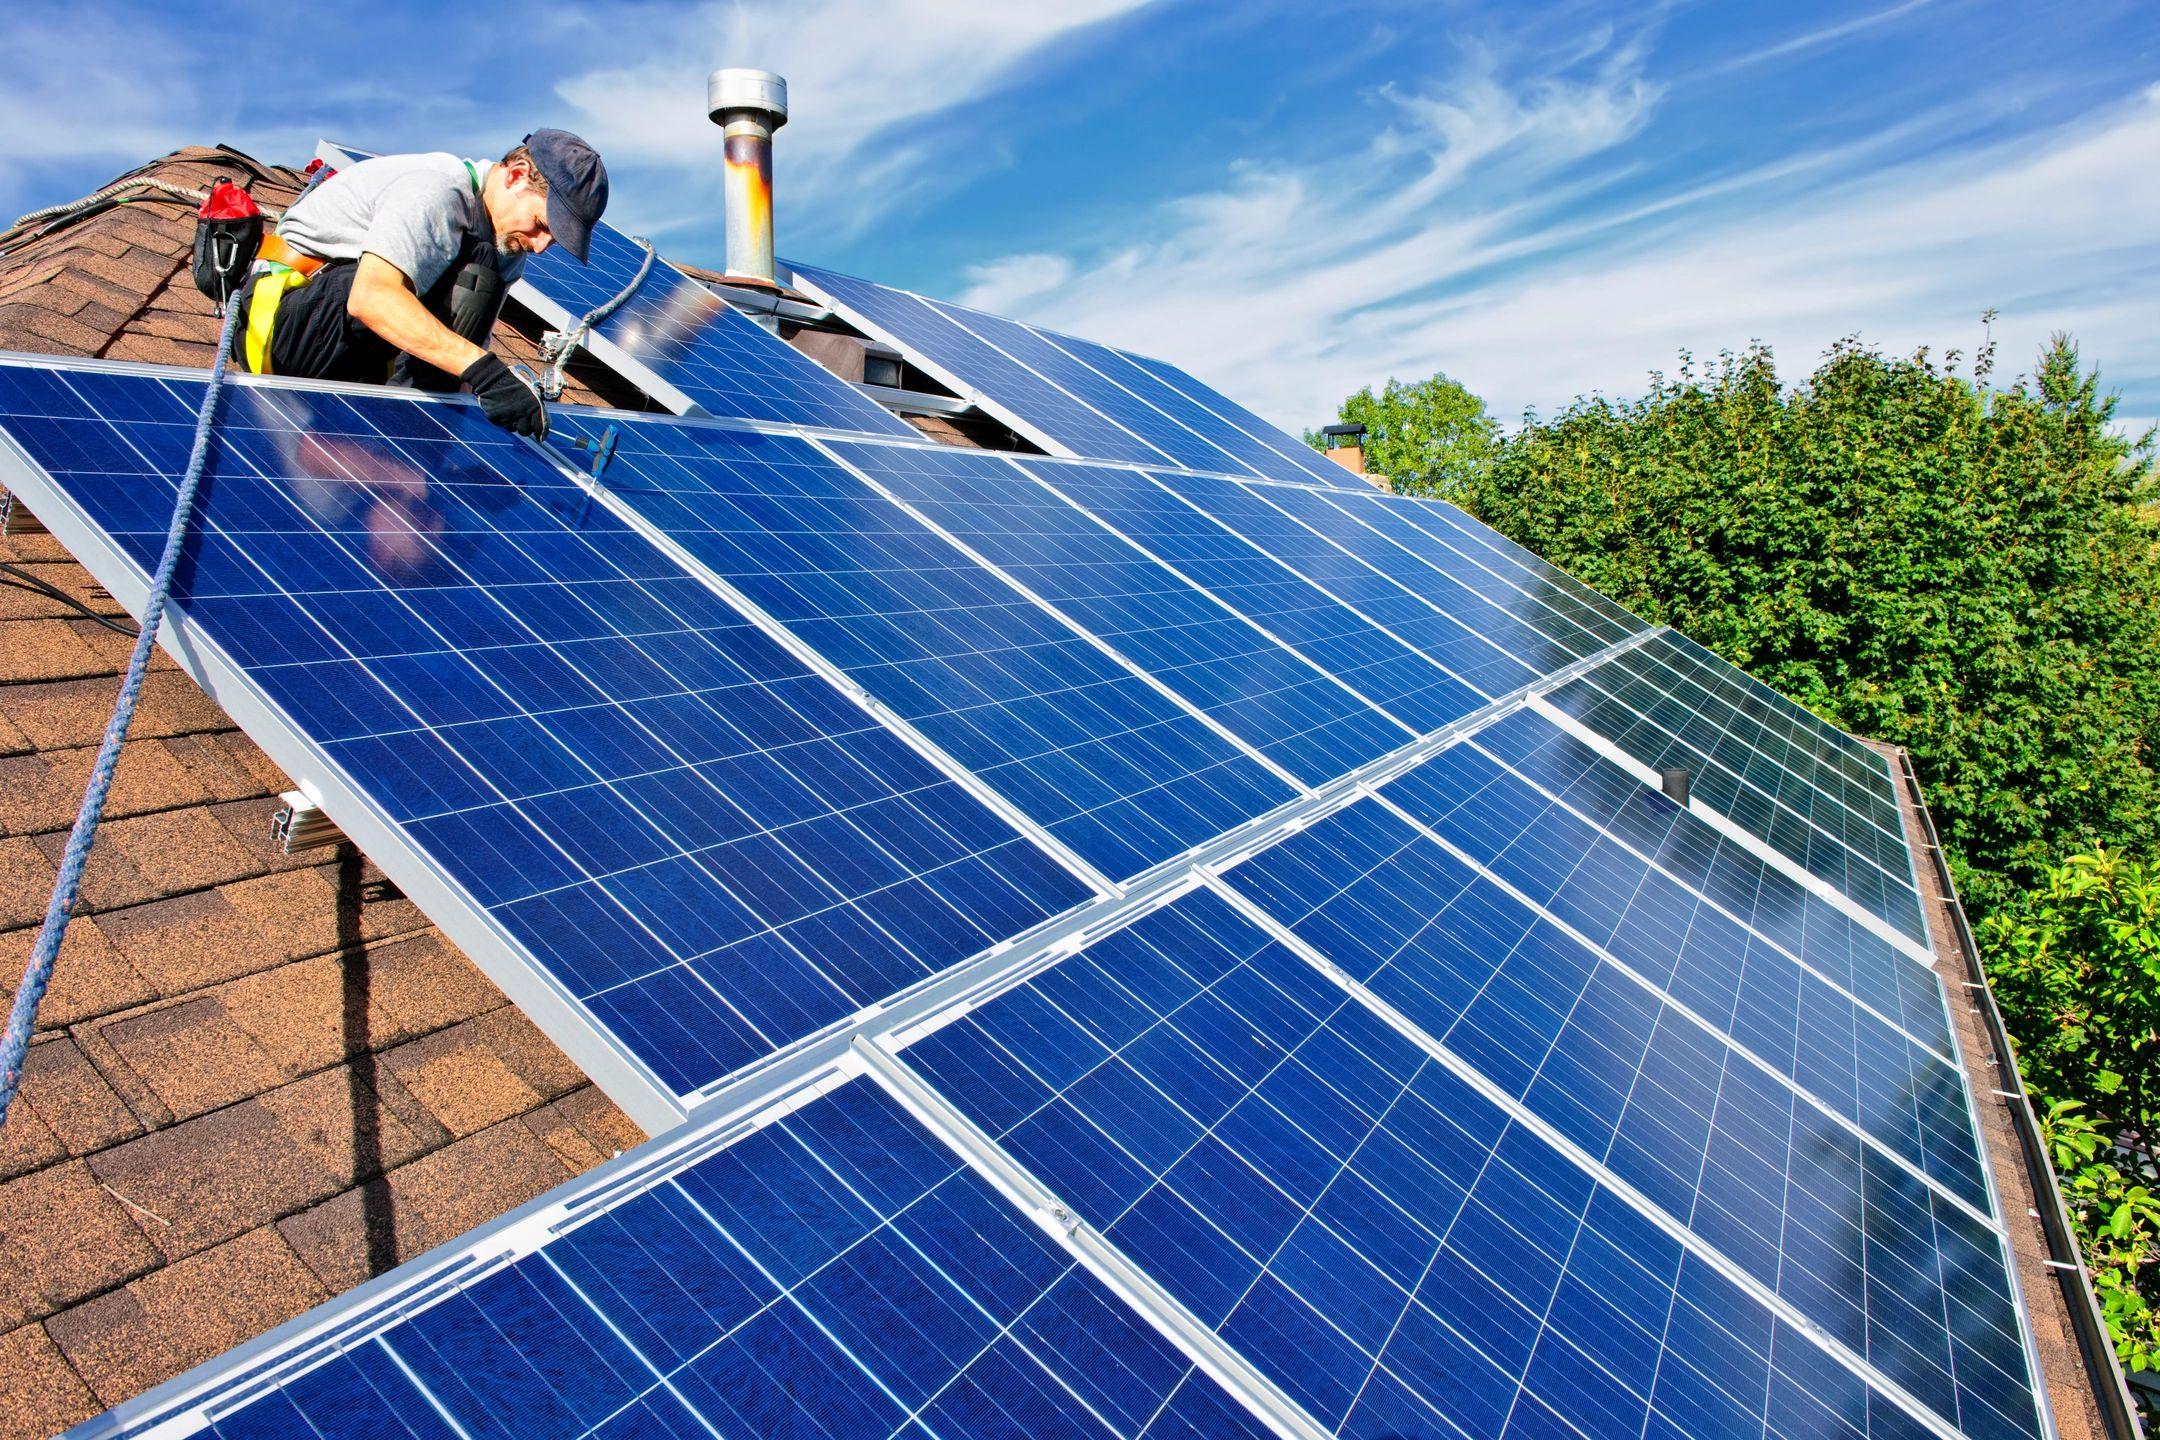 CfA Asks California Attorney General to Investigate Solar Industry